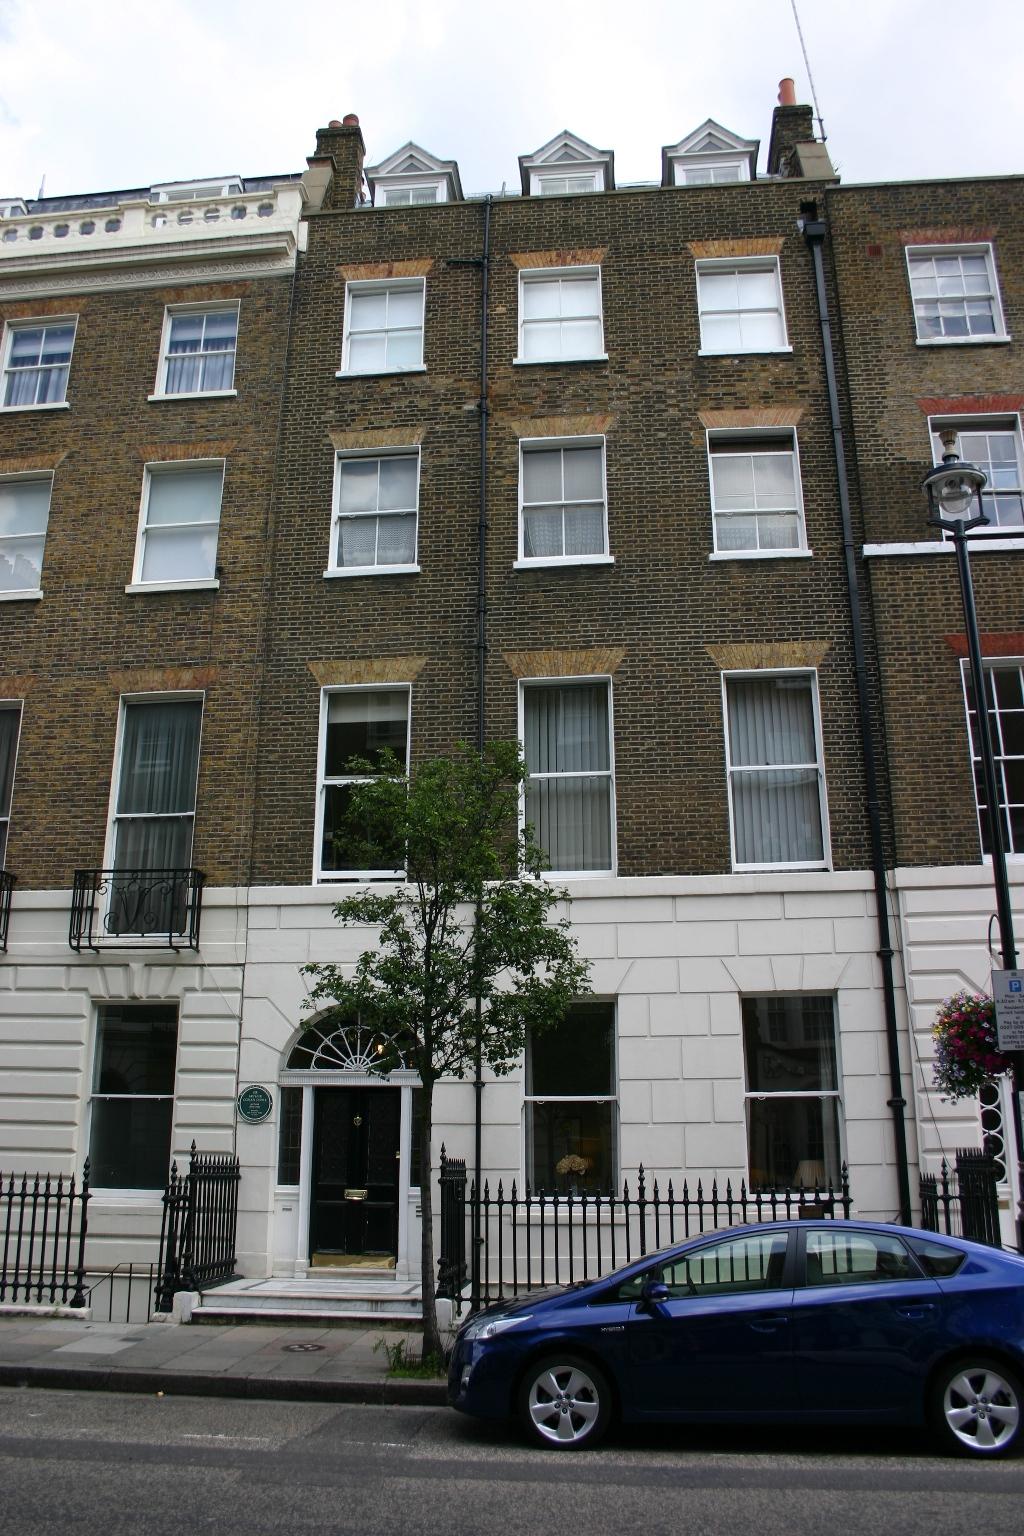 Arthur Conan Doyle S Consulting Room Himetop